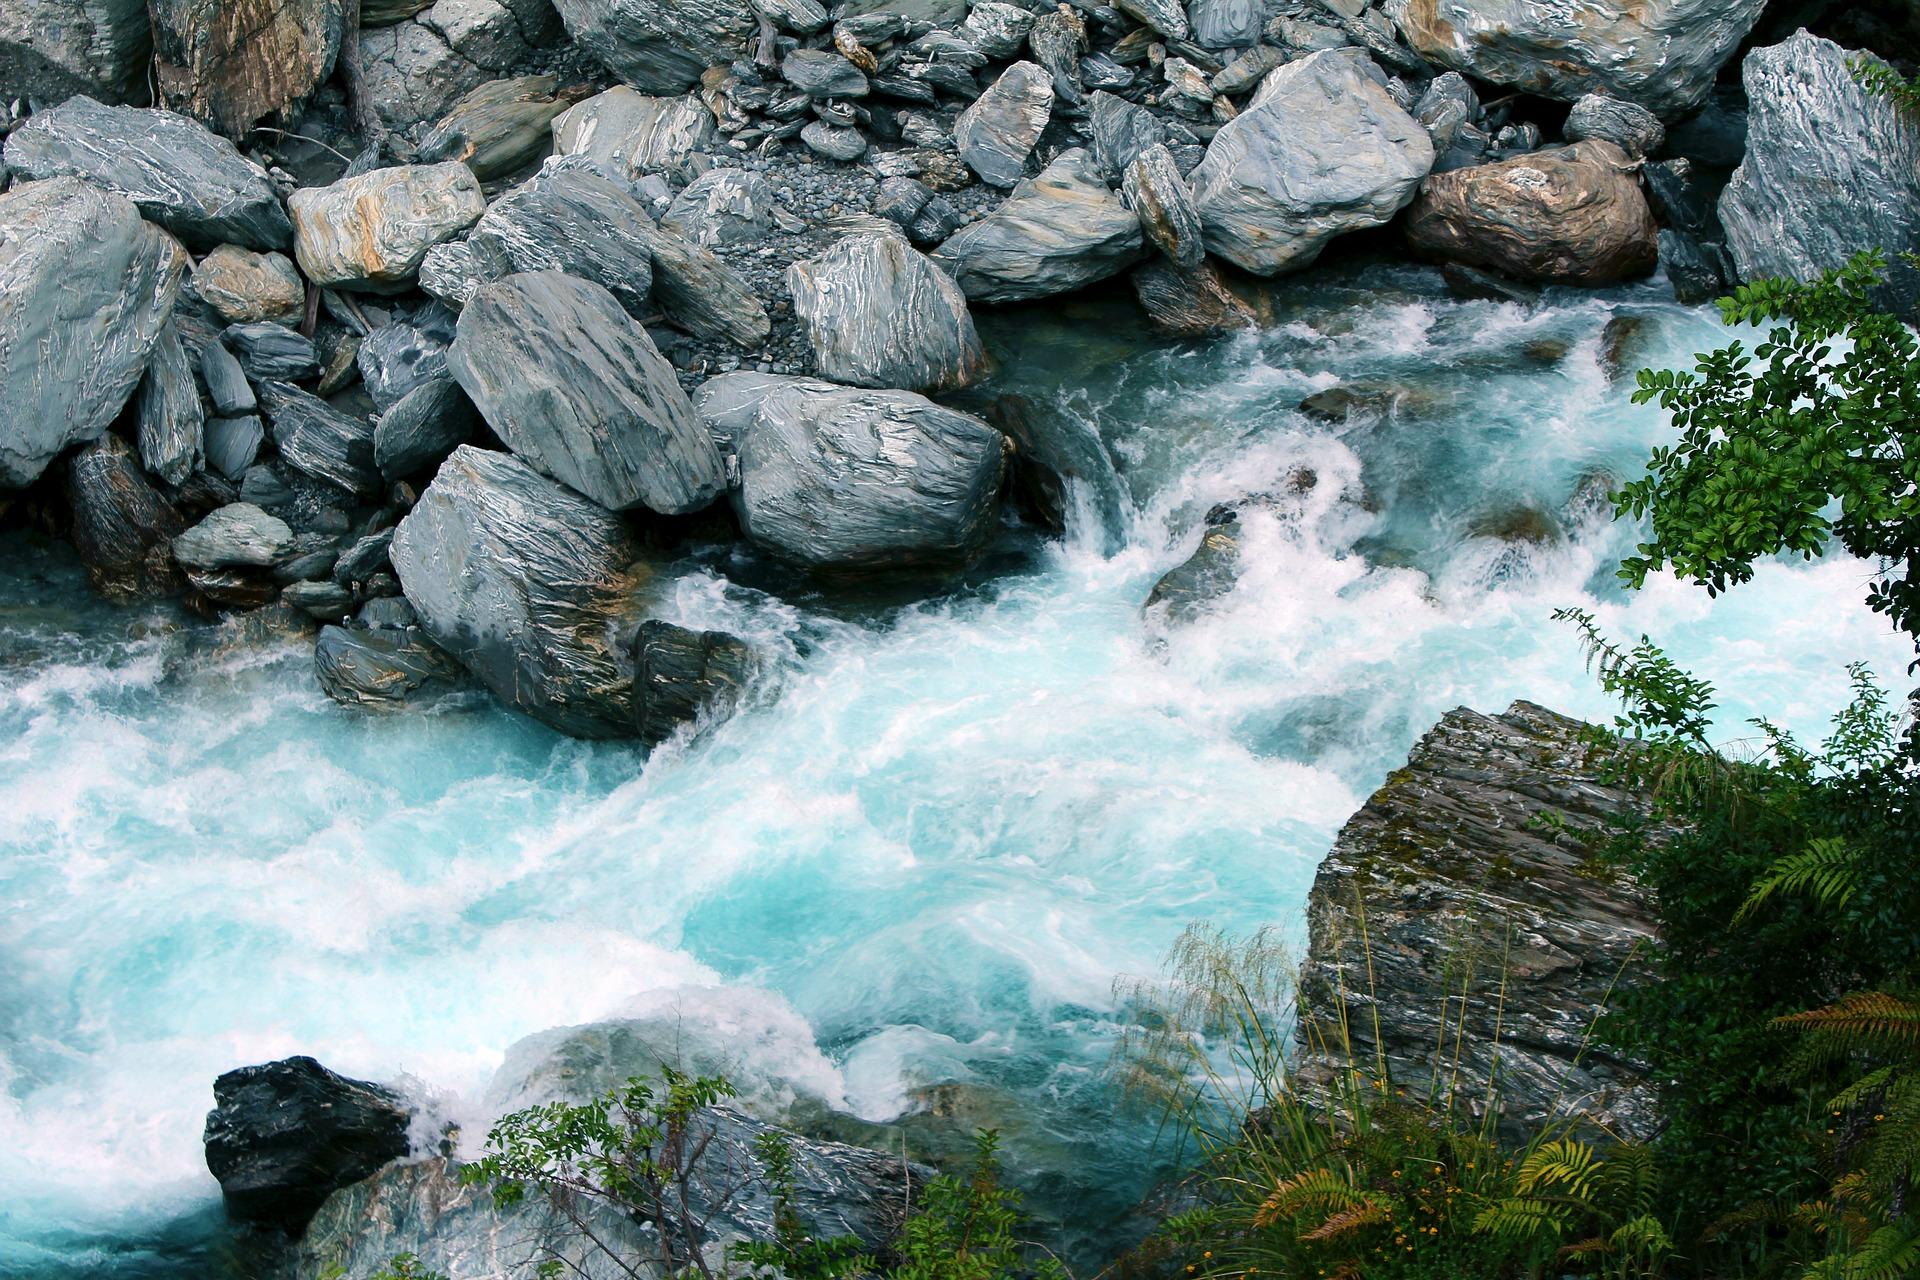 waterfall-2269685_1920.jpg